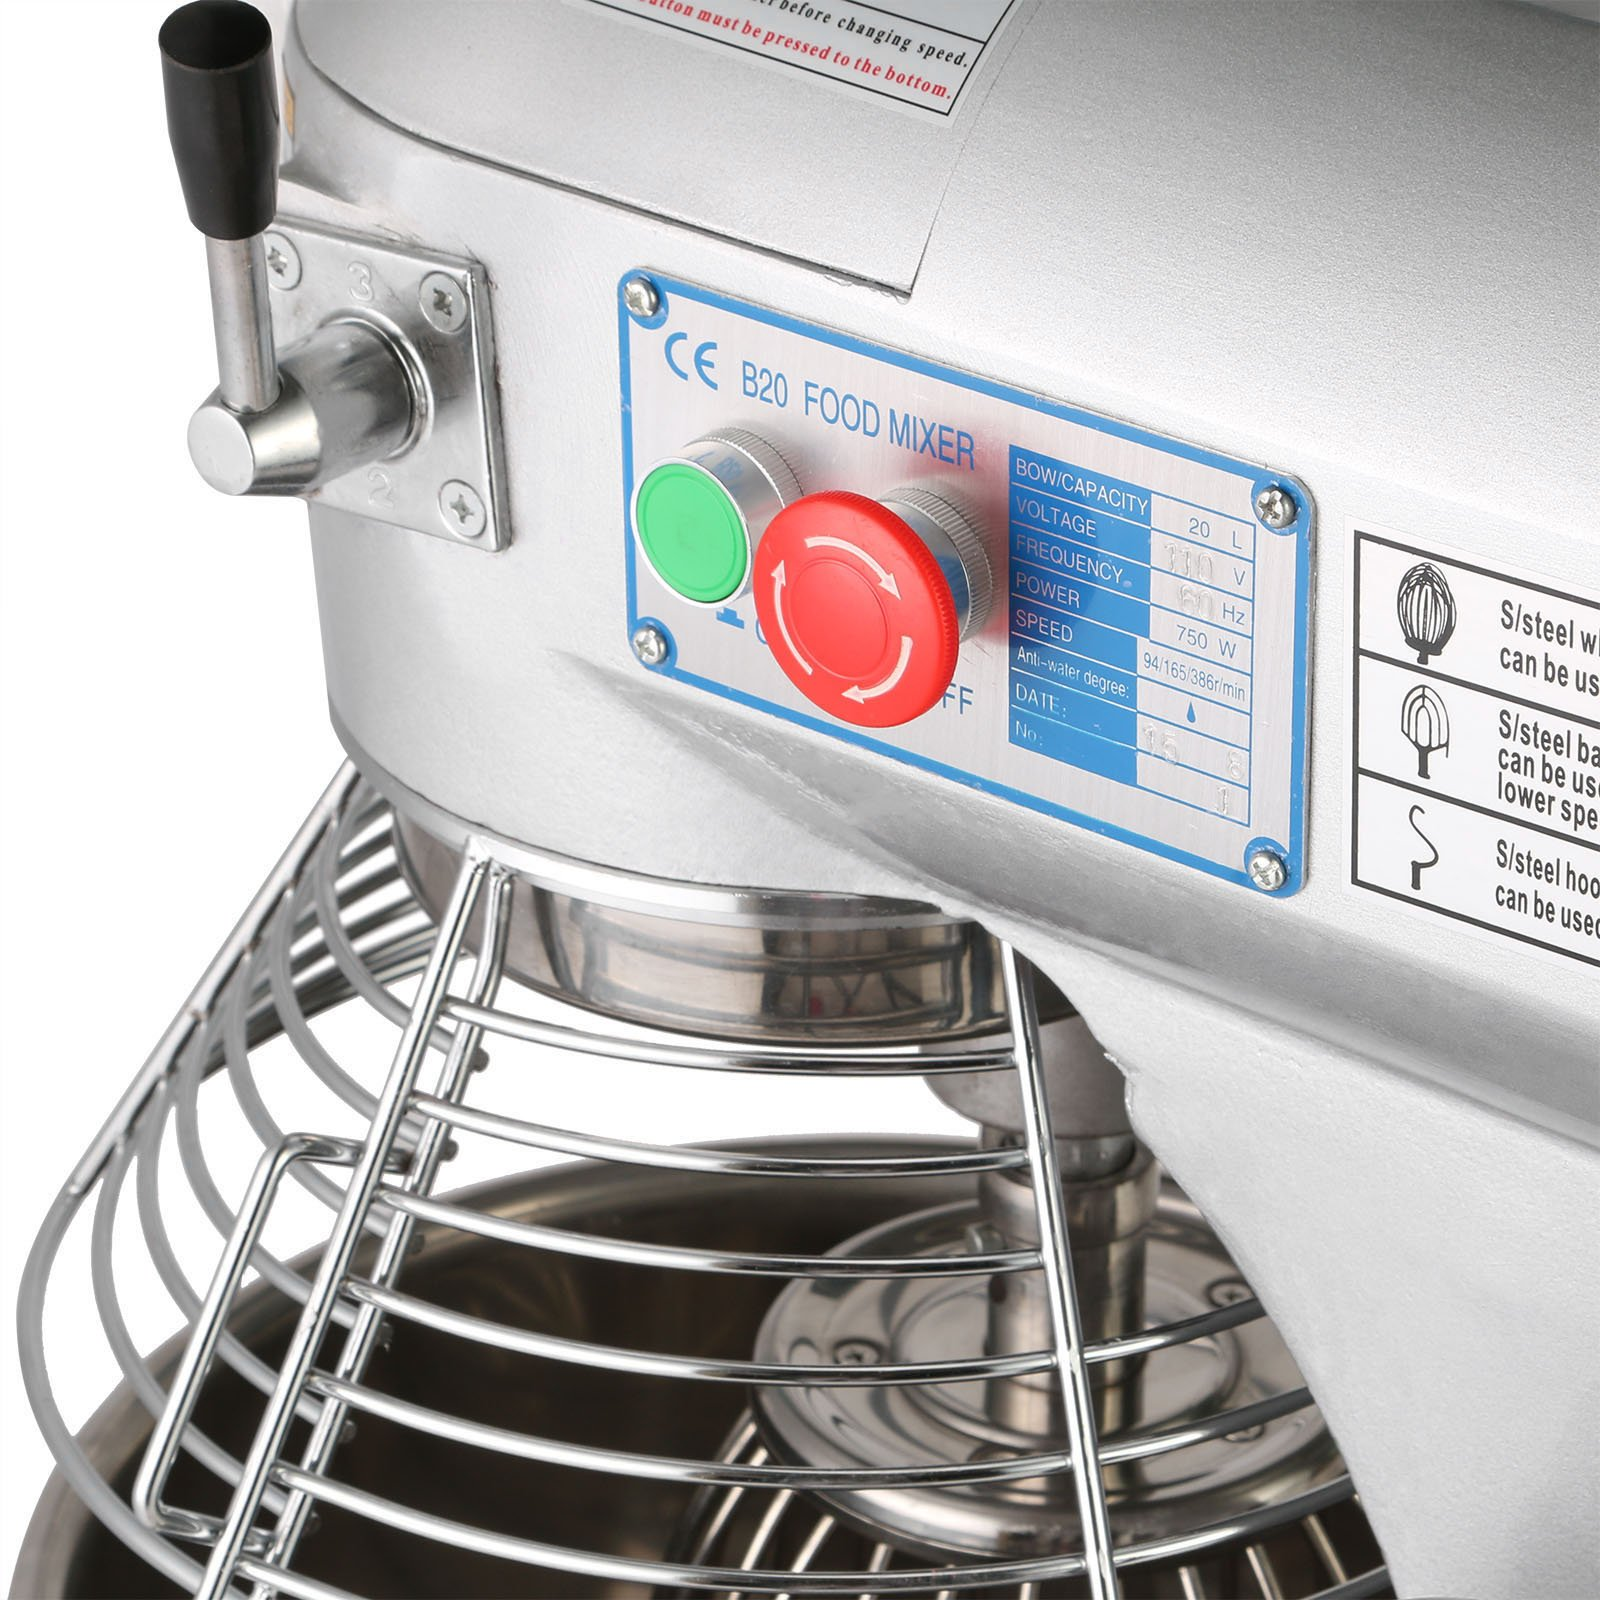 Happybuy Commercial Food Mixer 750W Dough Mixer Maker 3 Speeds Adjustable Commercial Mixer Grinder 94/165/386 RPM Stand Mixer (20 qt) by Happybuy (Image #4)